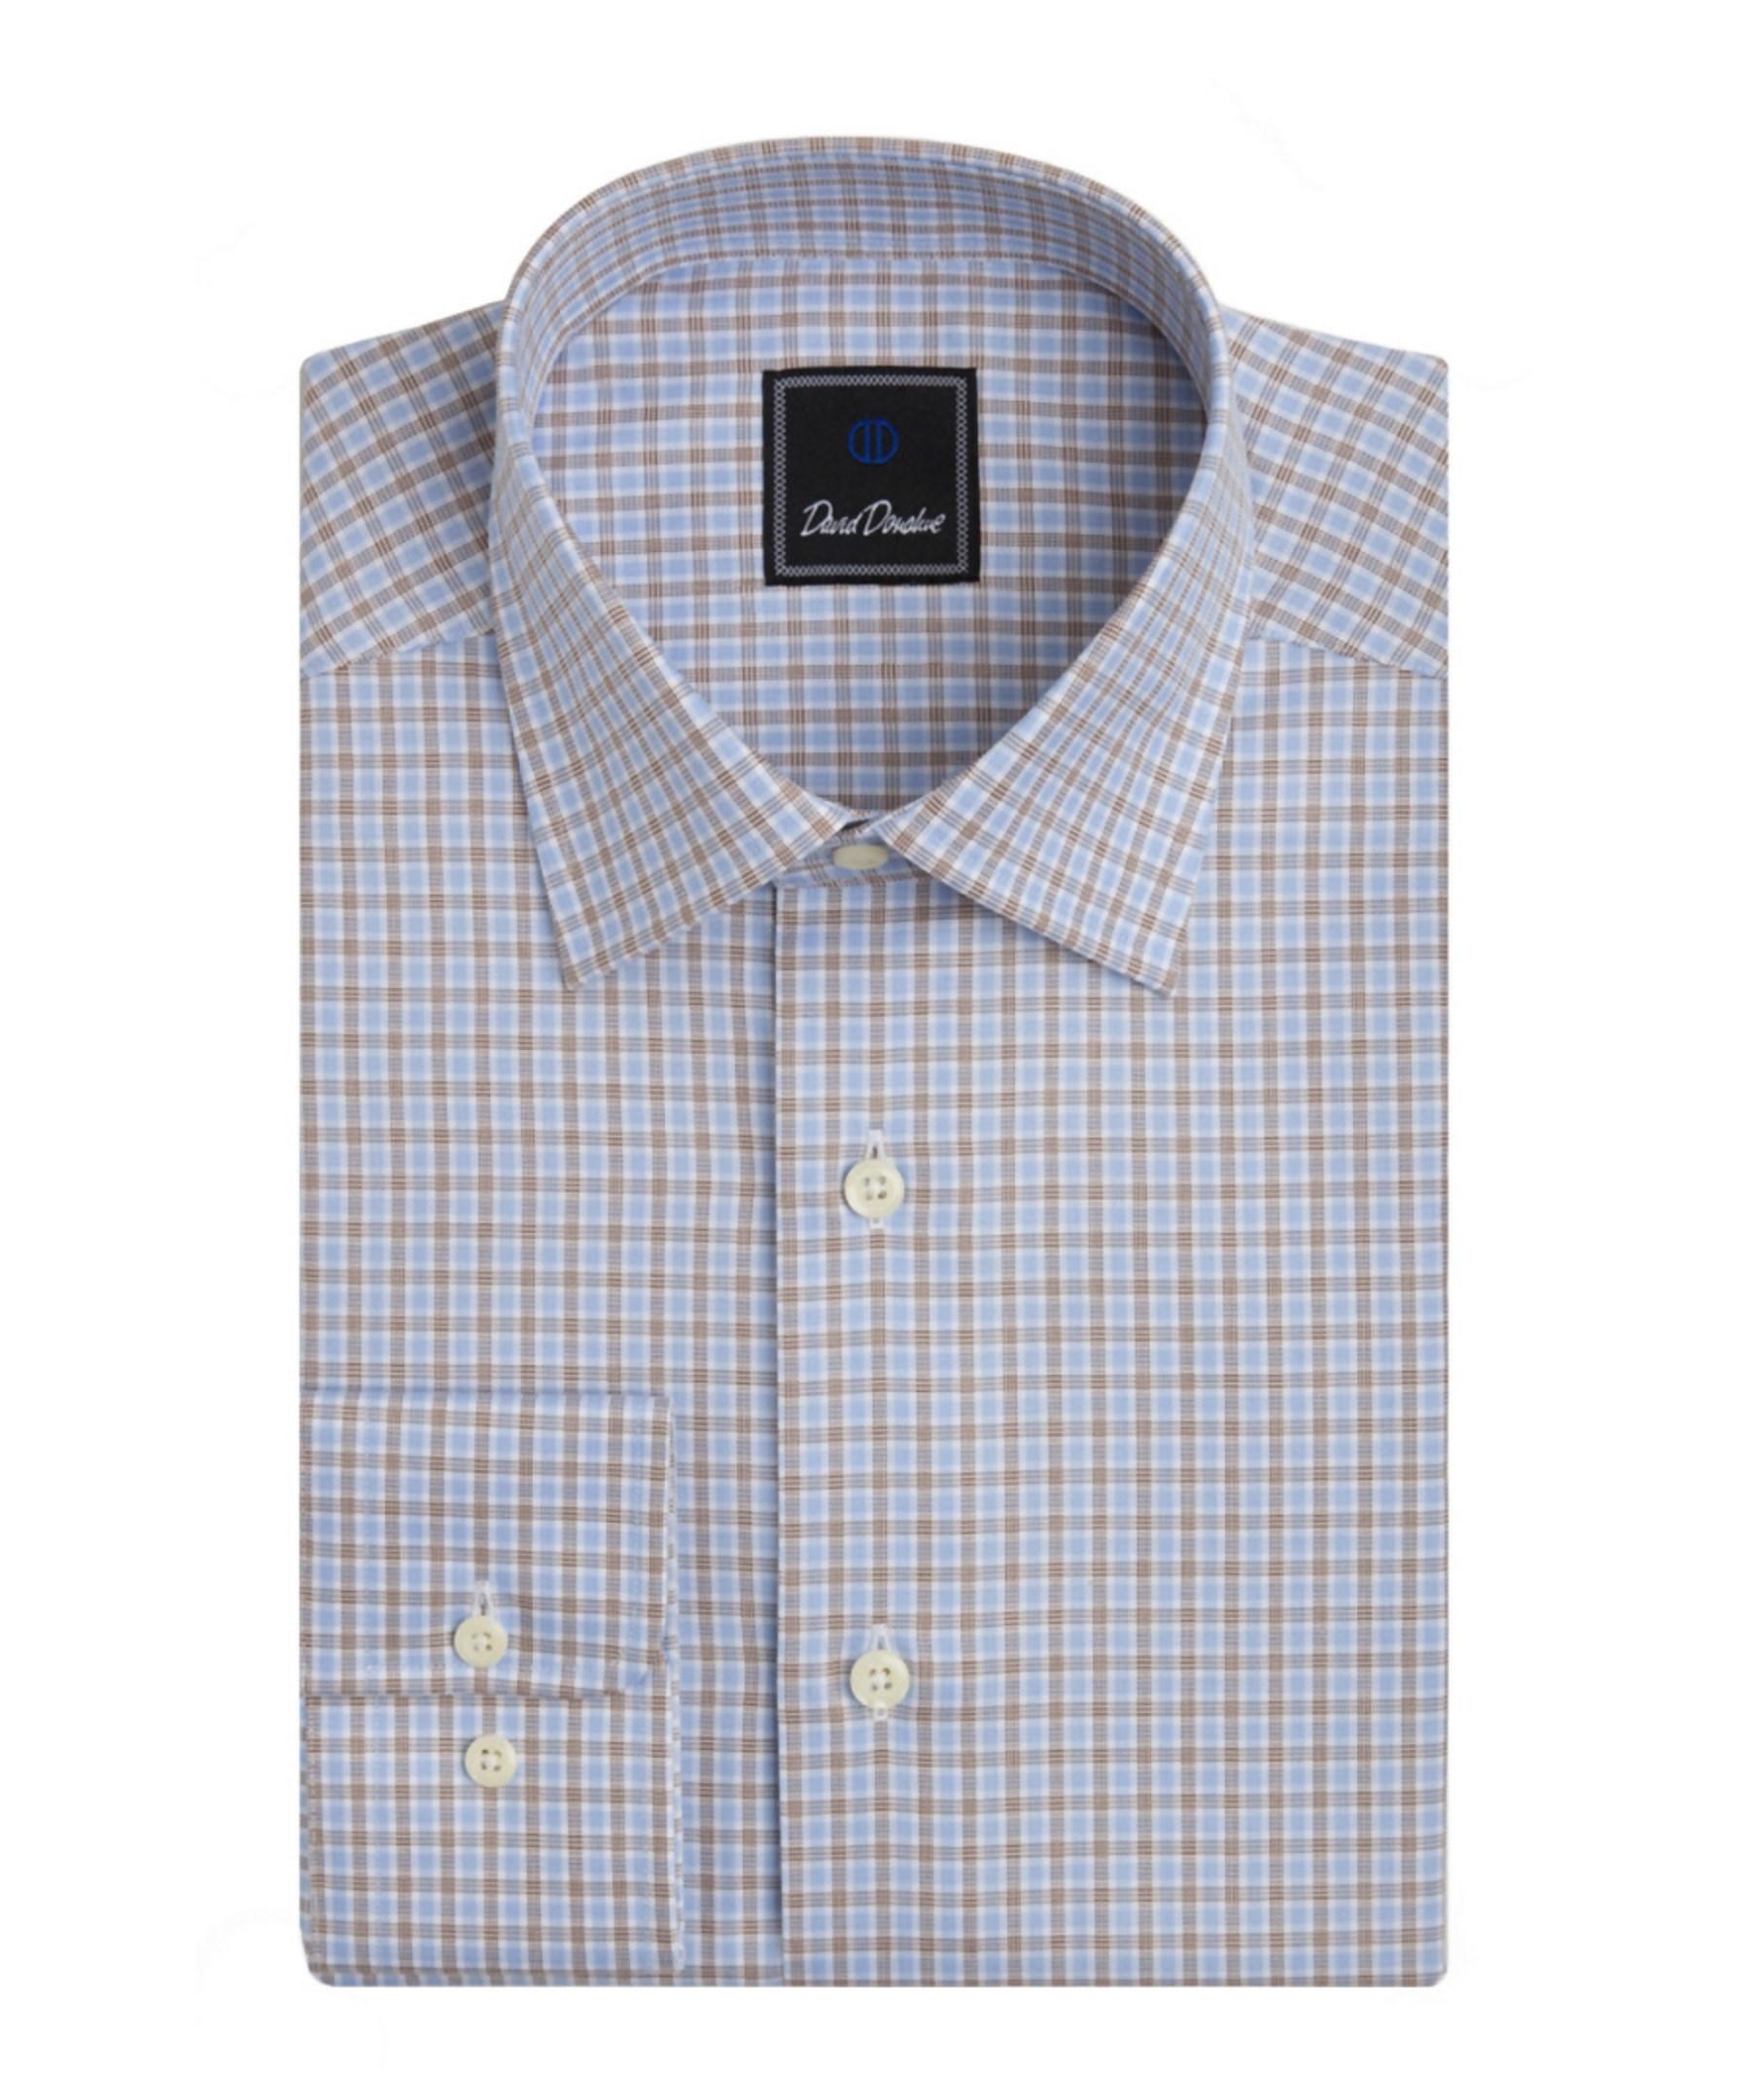 David donahue regular fit dress shirt in blue for men lyst for Regular fit dress shirt